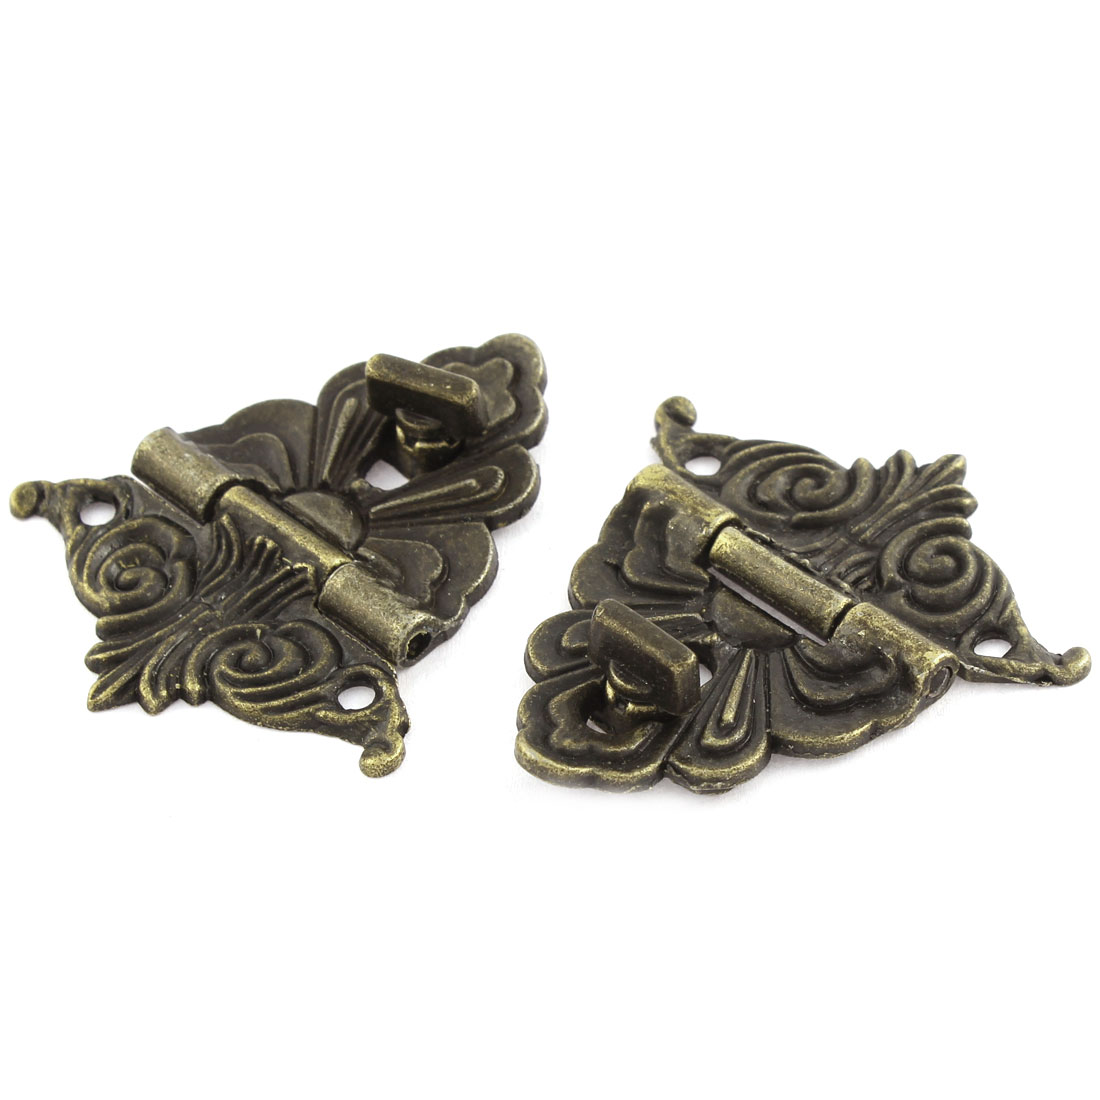 2 Pcs Zinc Alloy Hardware Floral Antique Style Wooden Gift Box Latchs Buckle